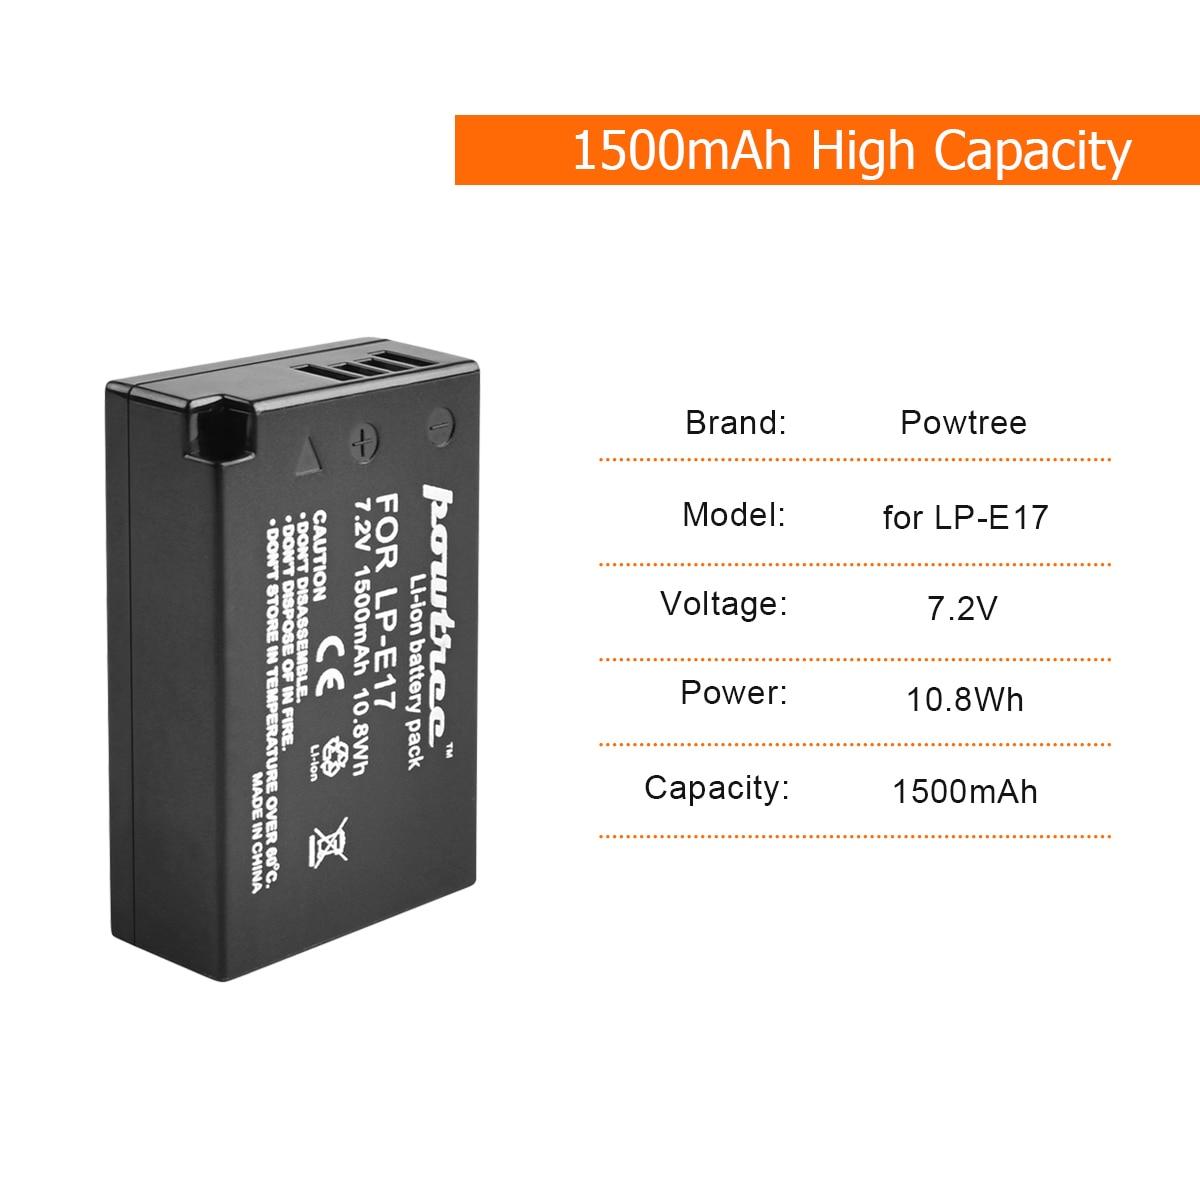 1Packs 7 2V 1500mAh LP E17 LPE17 LP E17 Camera Battery USB Charger For Canon EOS M3 M5 750D 760D T6i T6s 8000D Kiss X8i L15 in Digital Batteries from Consumer Electronics